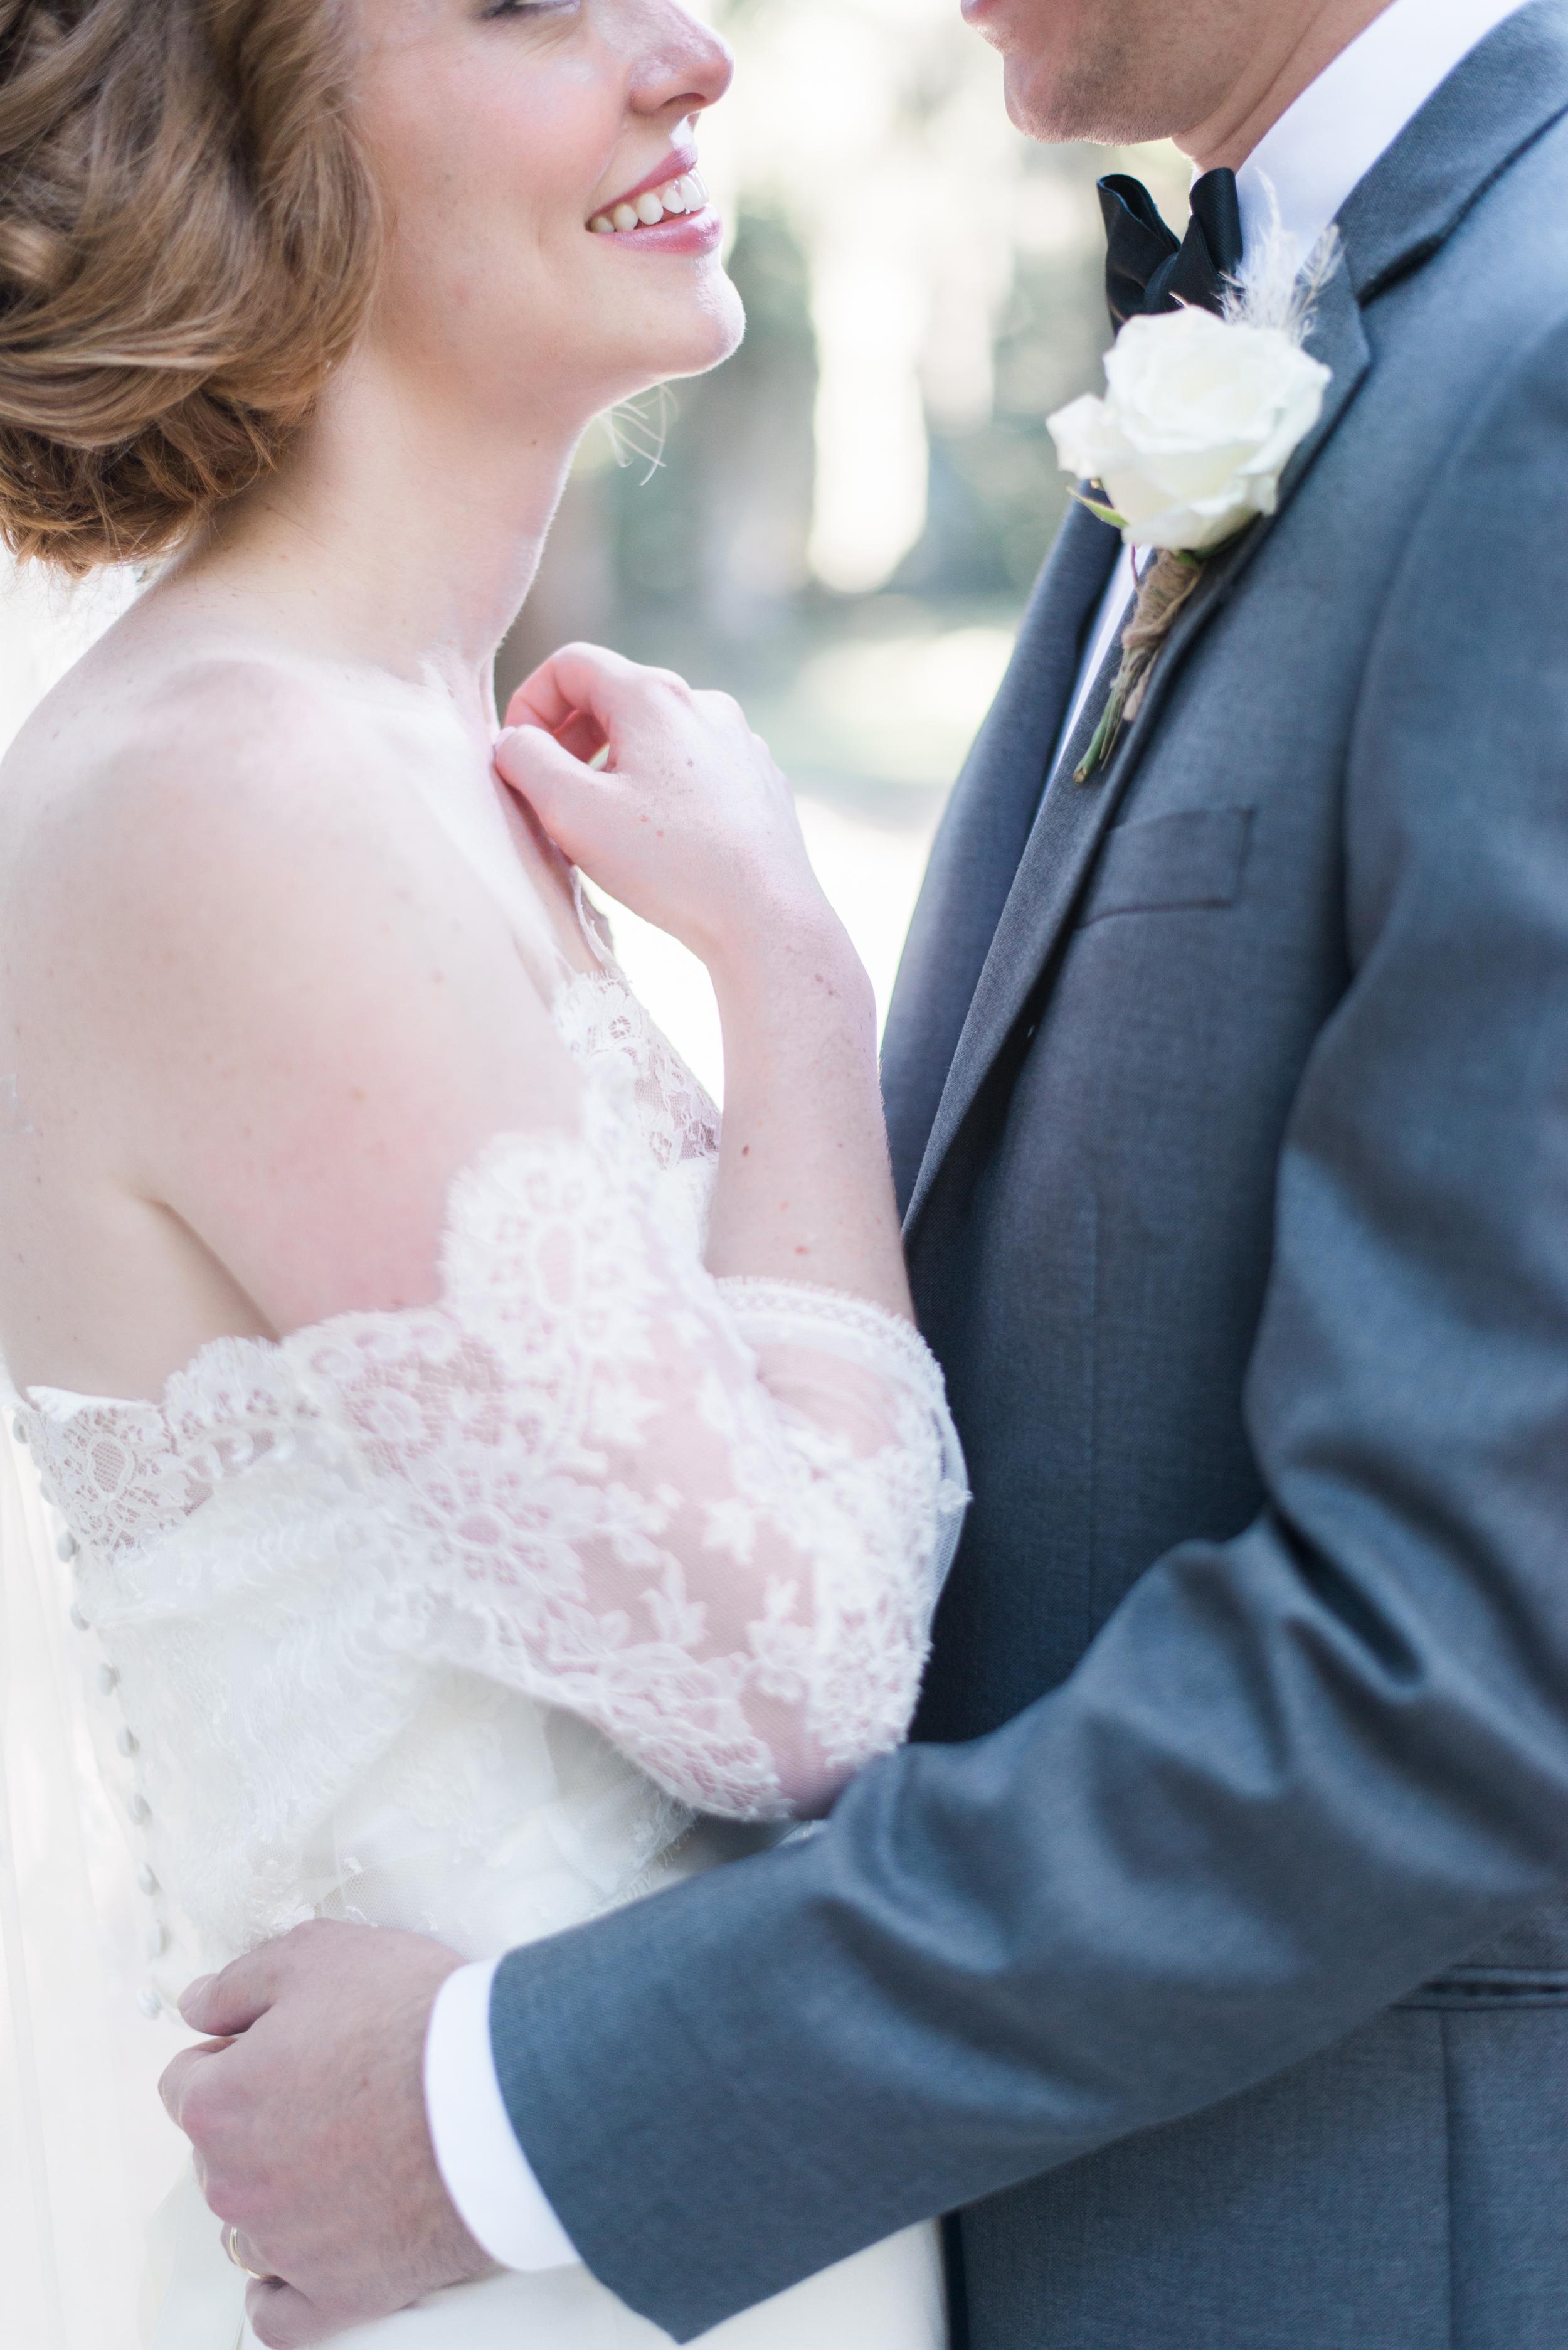 Southern Weddings on Daufuskie Island / cottagehillmag.com/journal/southern-weddings-on-daufuskie-island